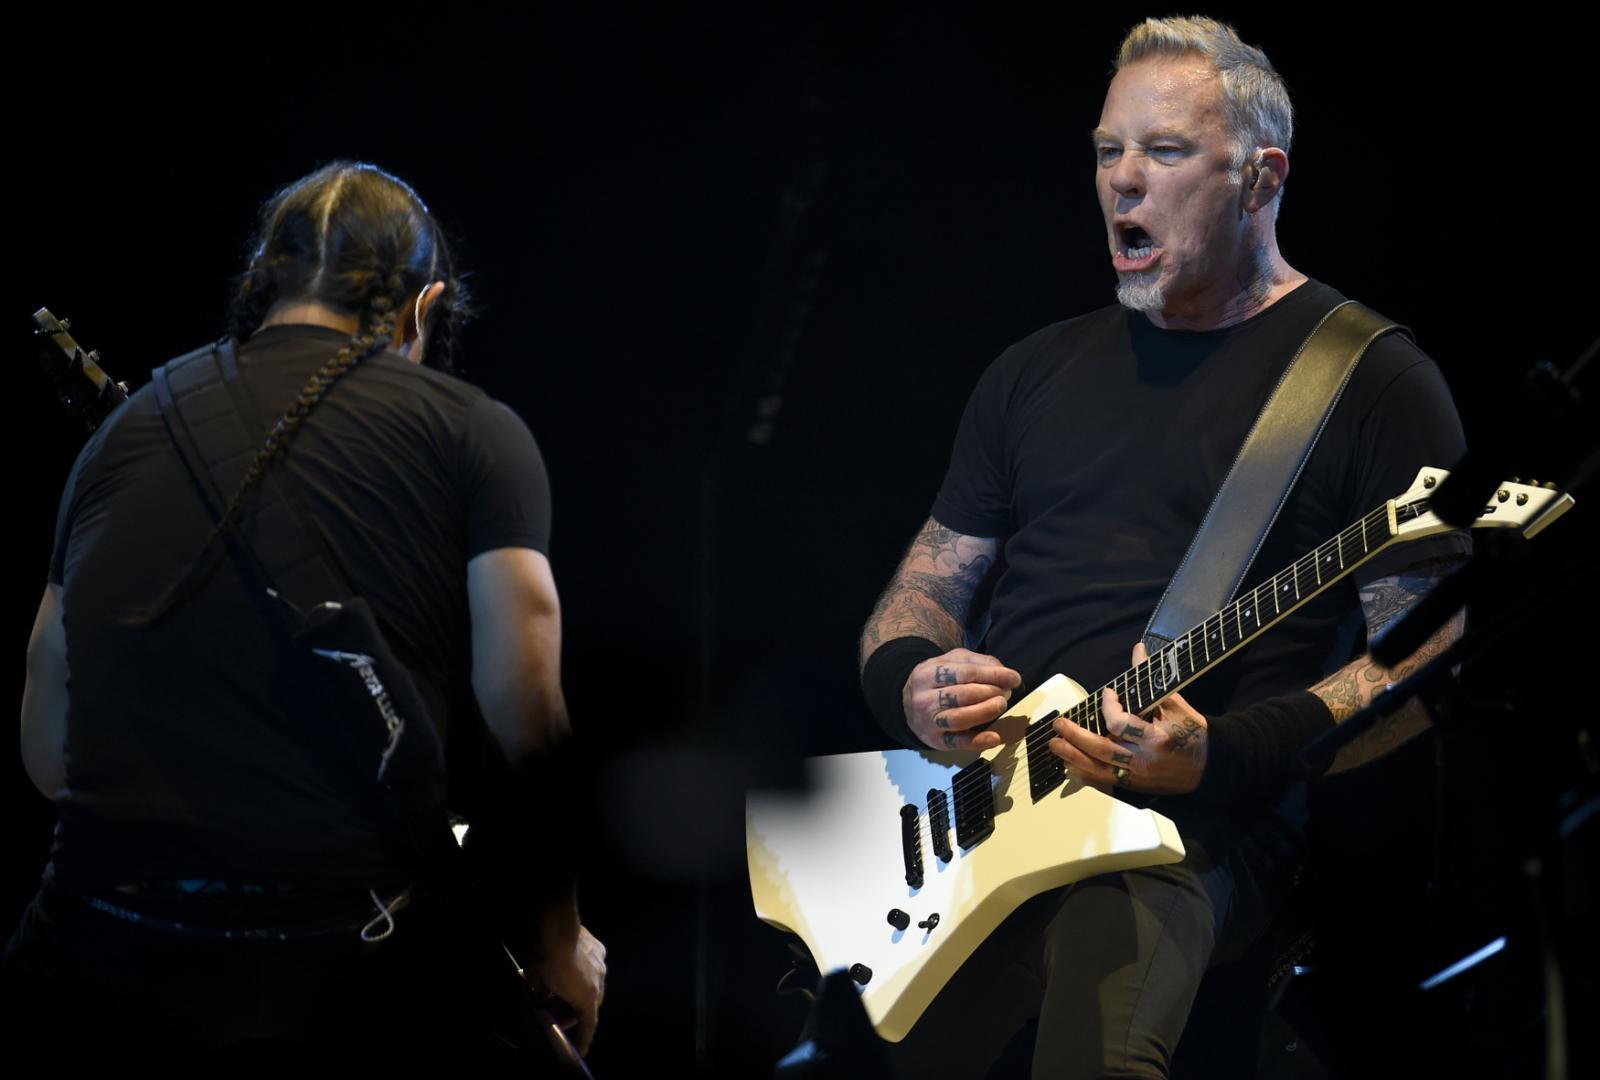 RECENZE: Metallica se po 4 letech vrátila do Prahy